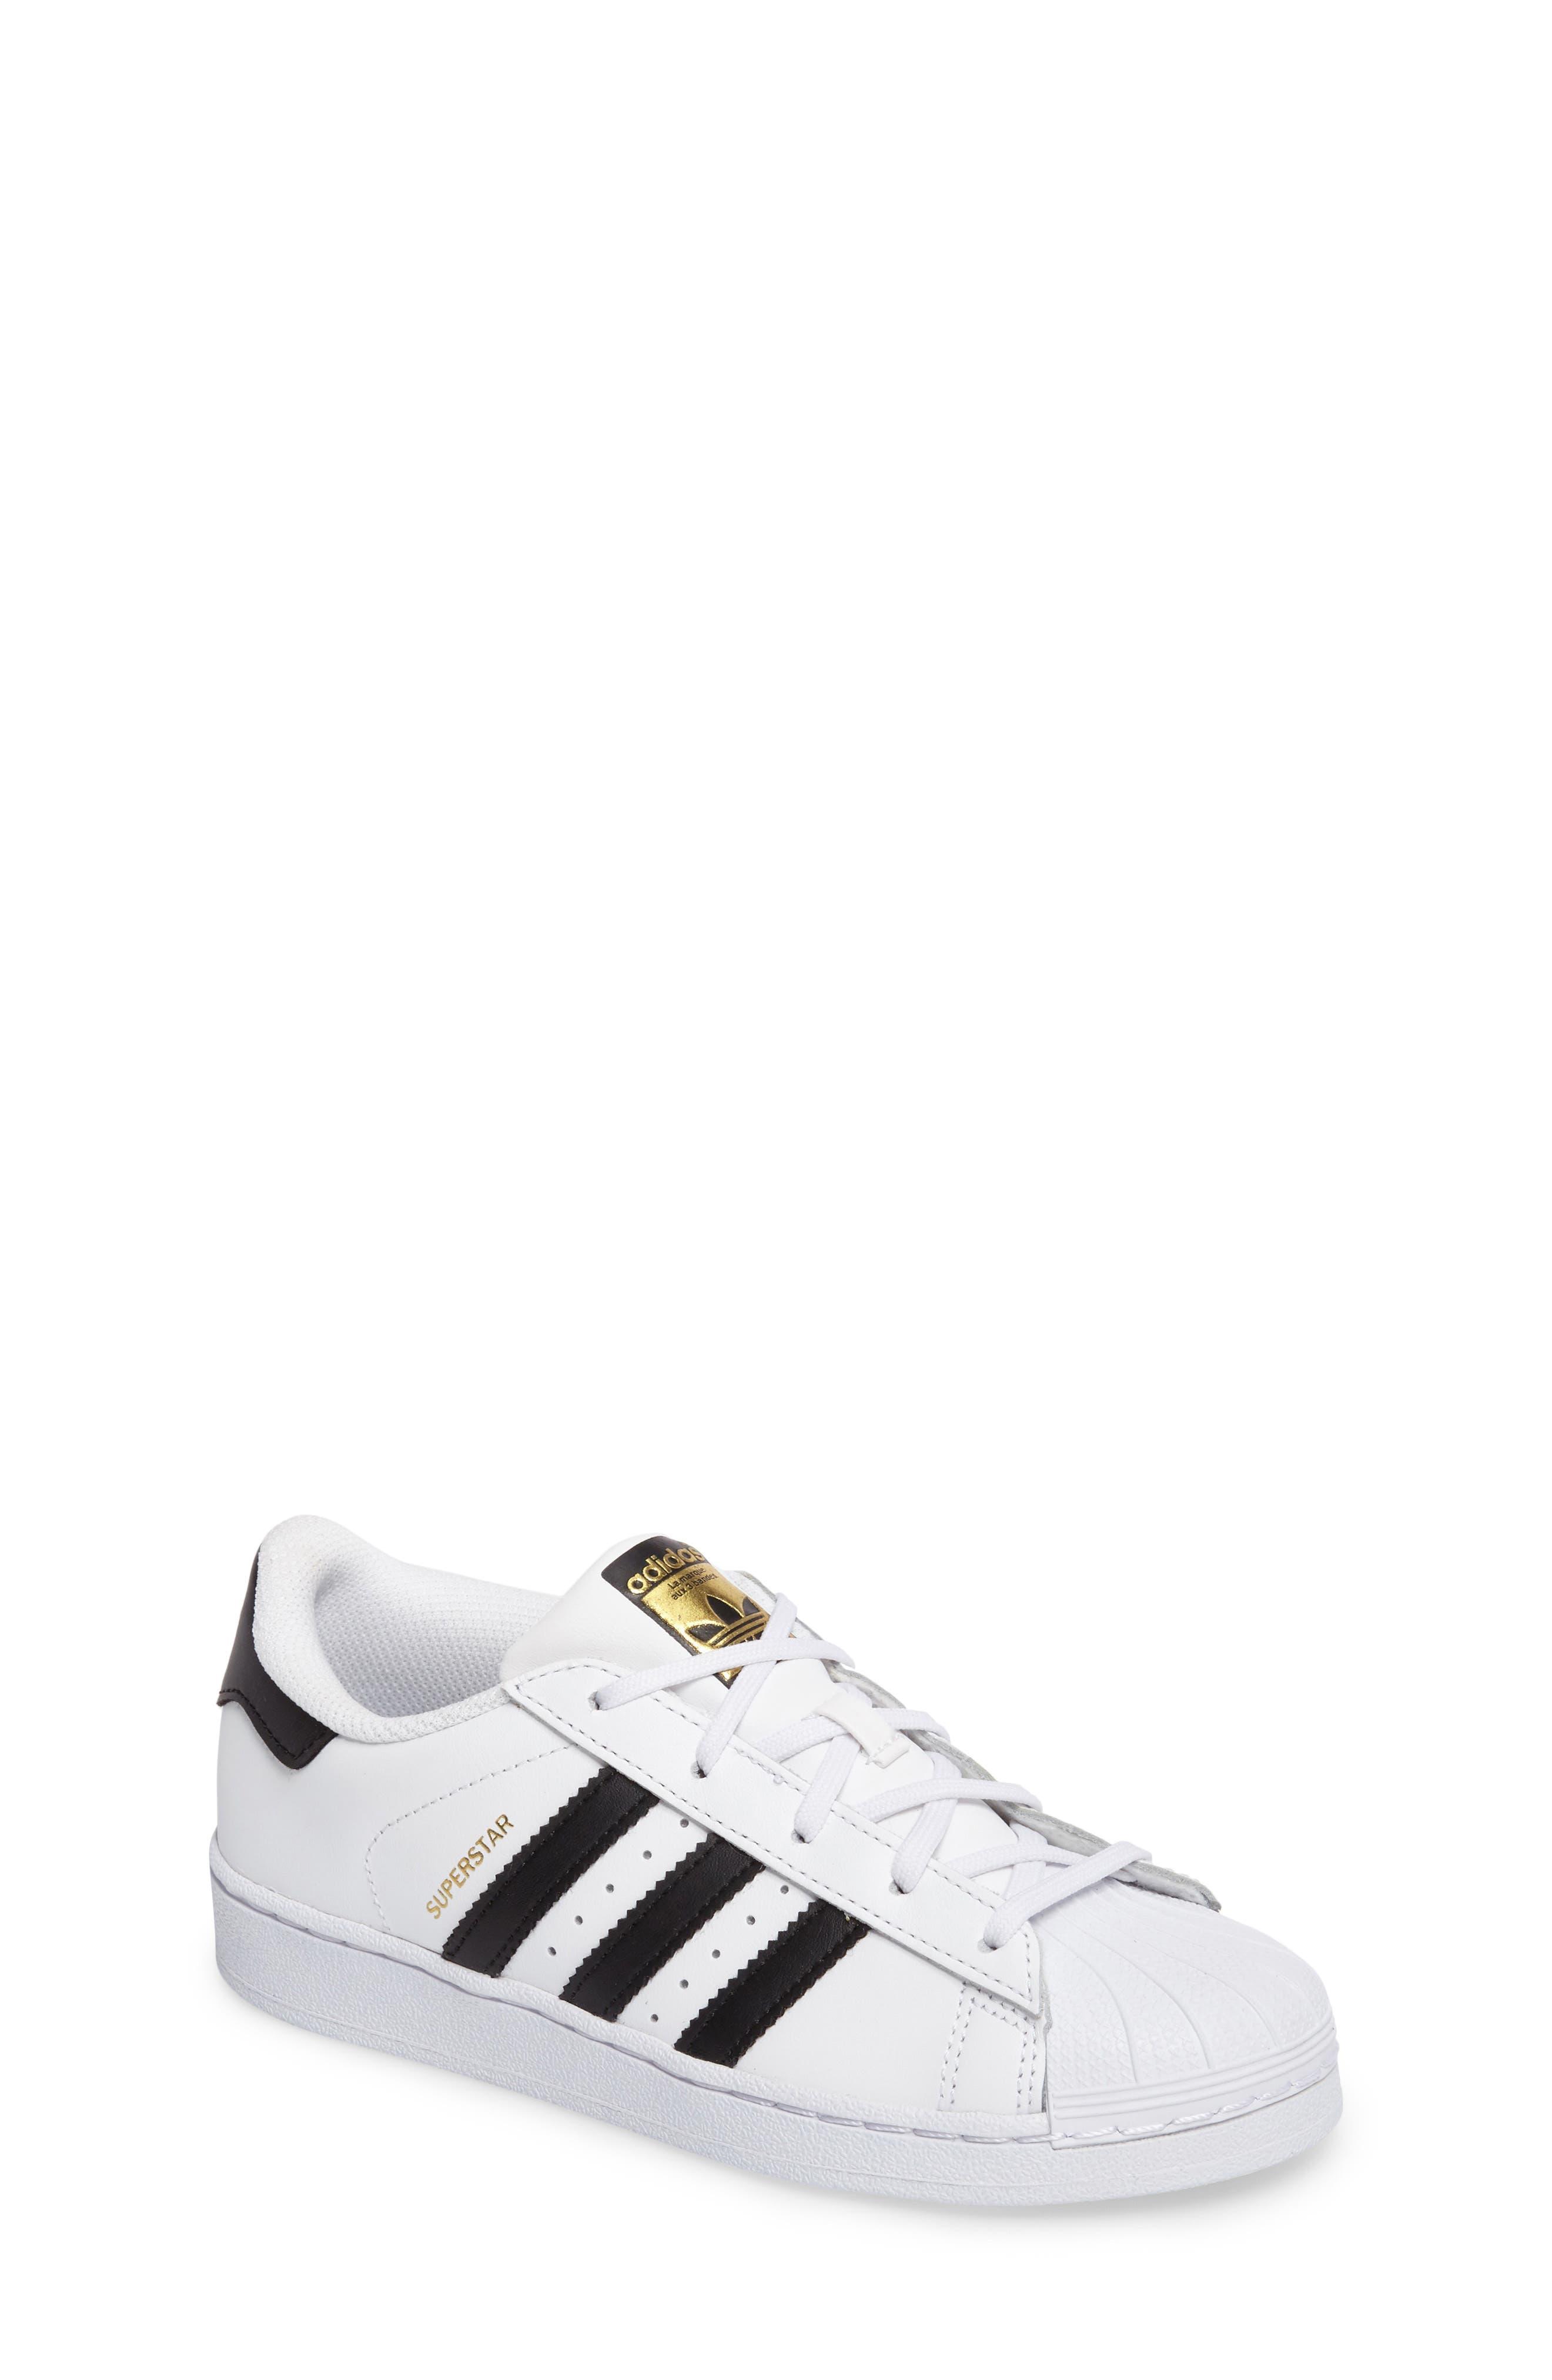 Main Image - adidas 'Superstar Foundation' Sneaker (Toddler & Little Kid)